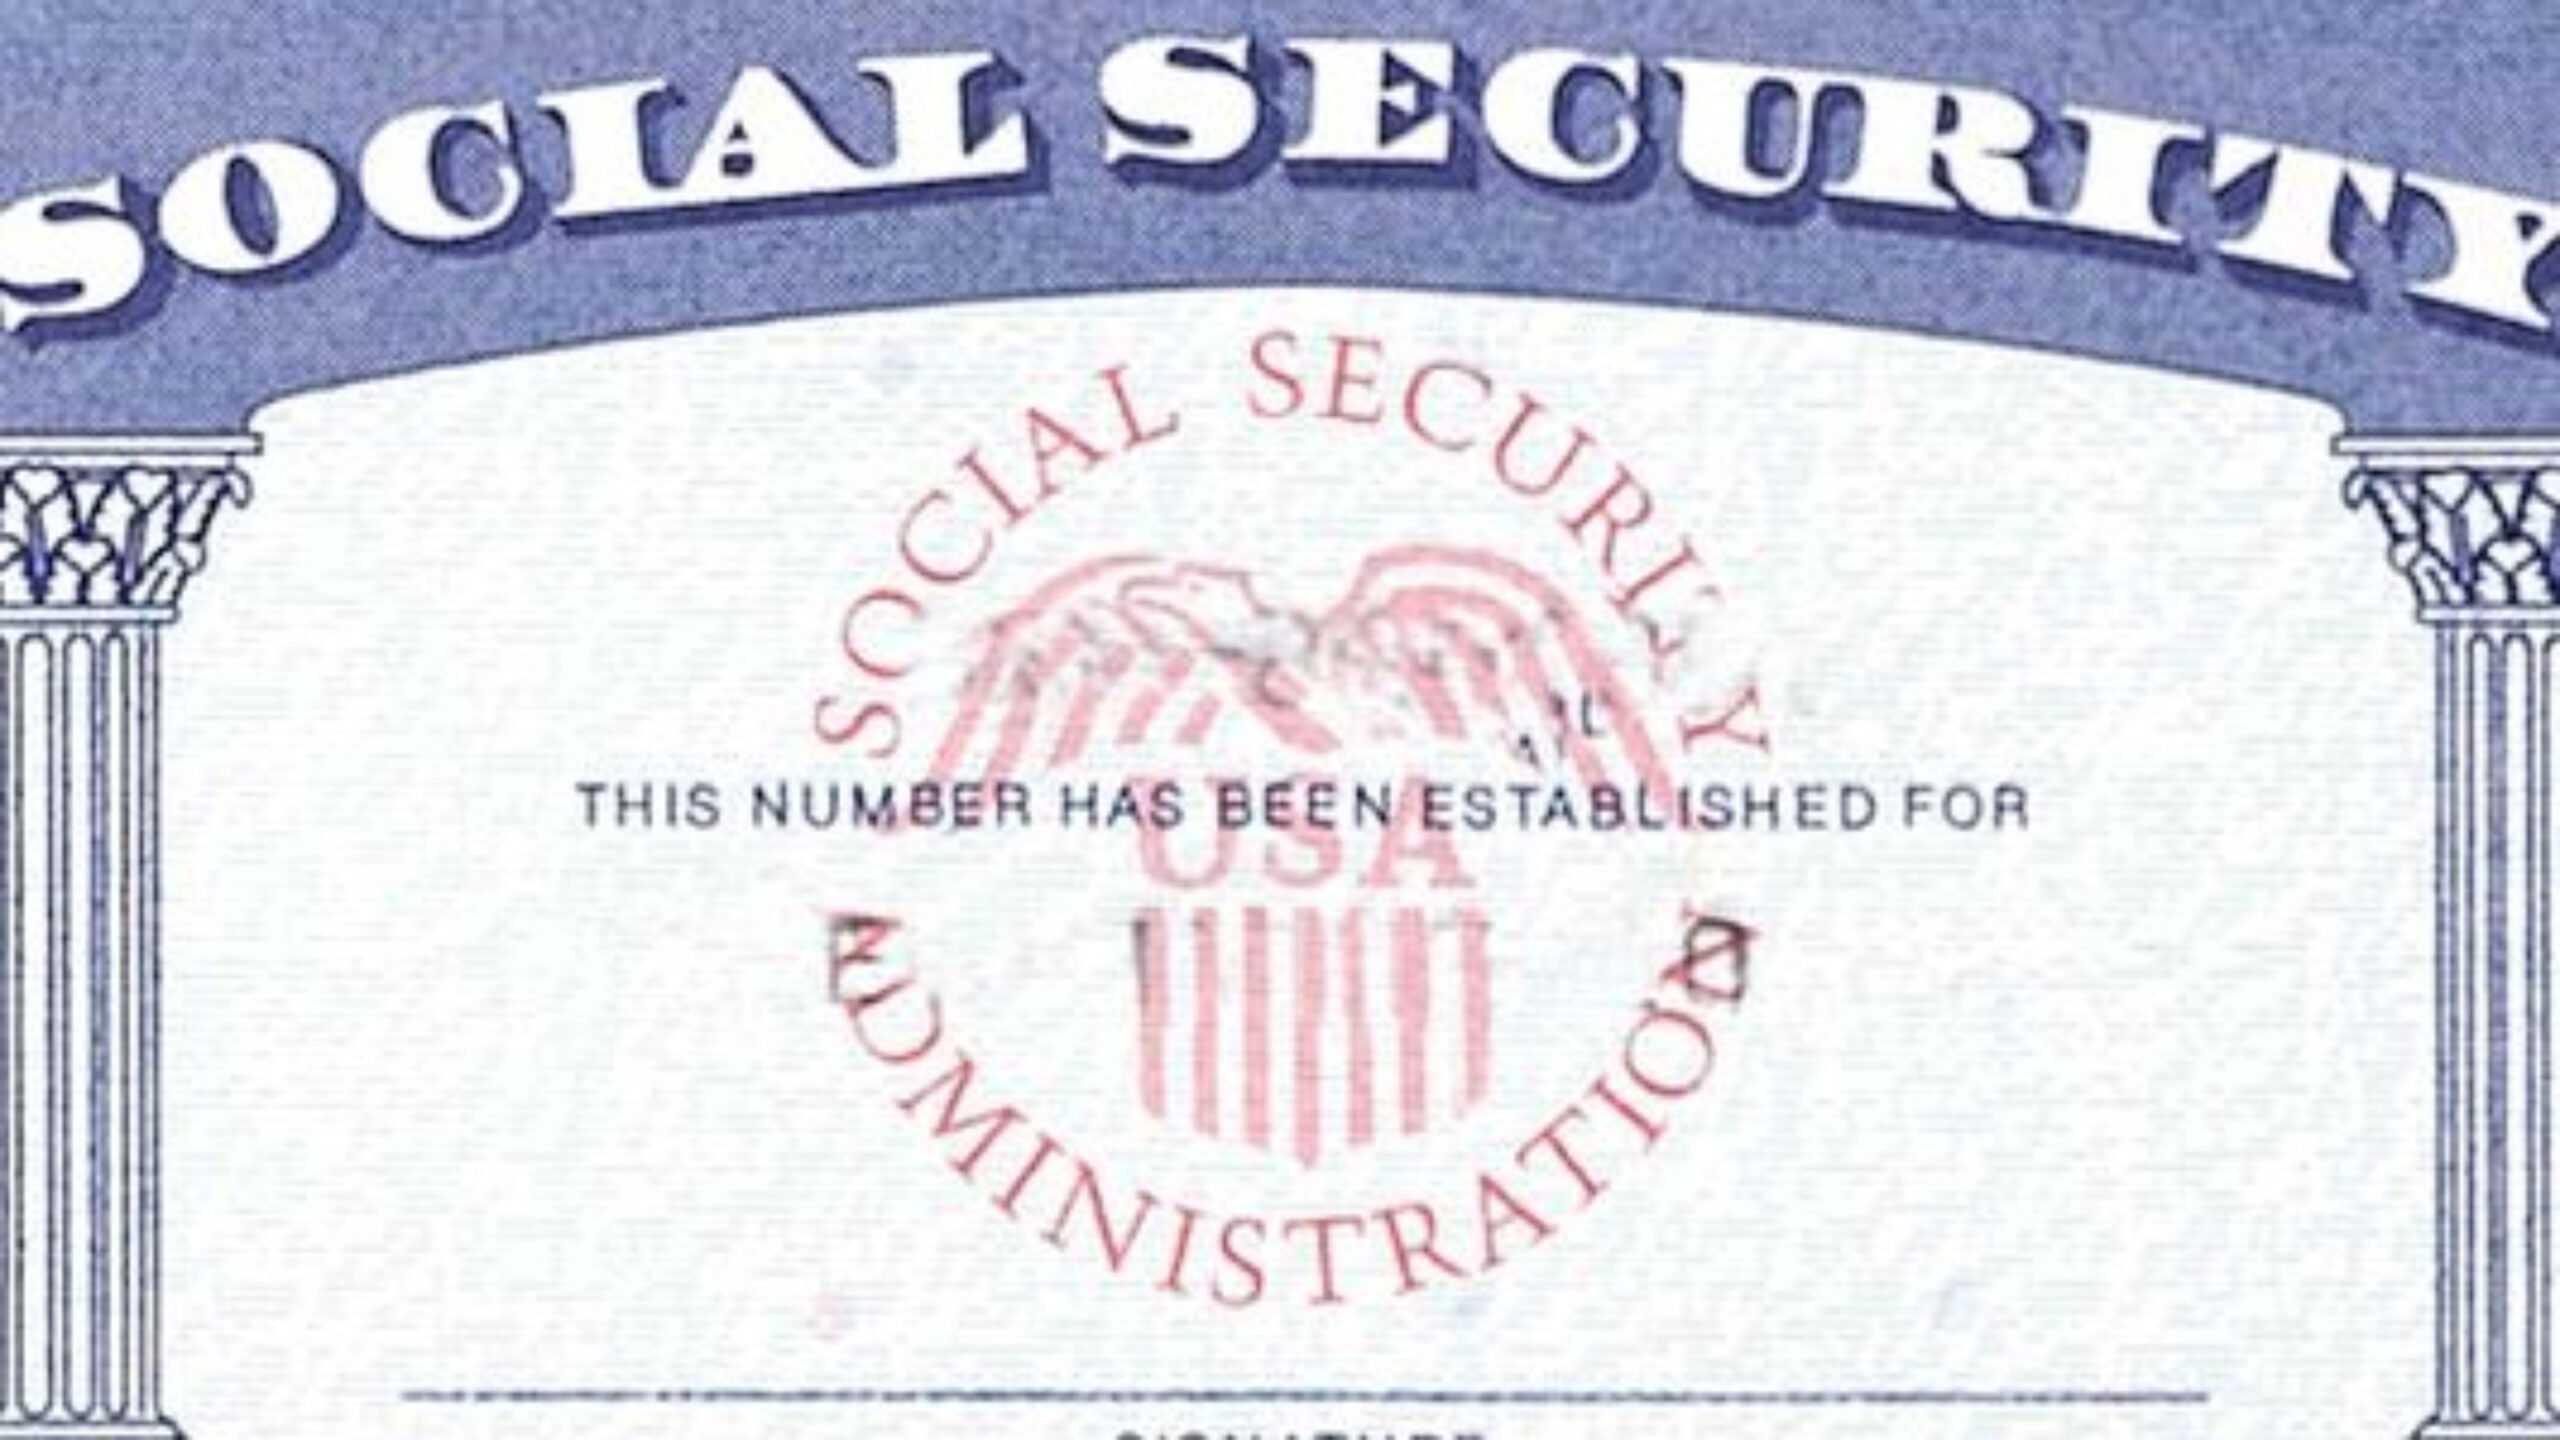 7 Social Security Card Template Psd Images - Social Security In Social Security Card Template Photoshop